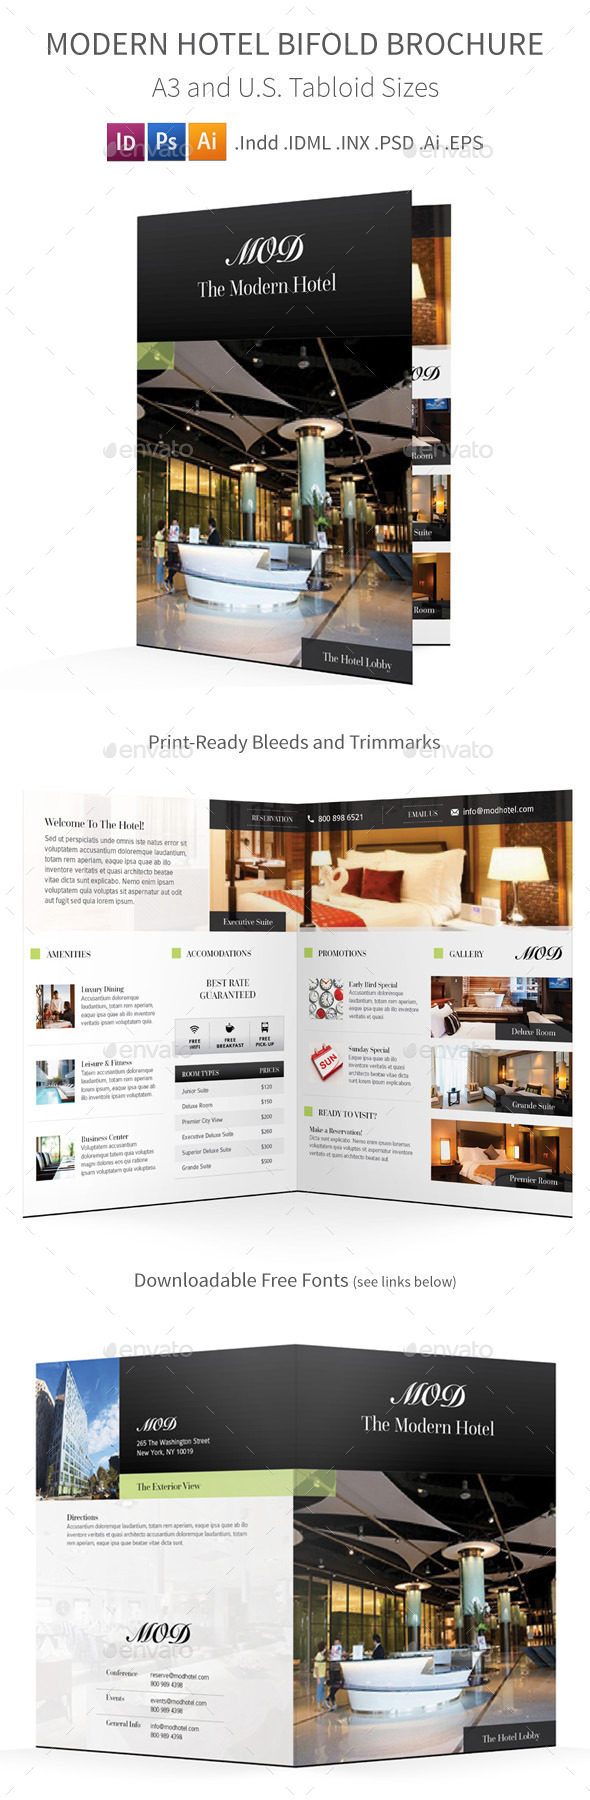 GraphicRiver Modern Hotel Bifold Halffold Brochure 9299549